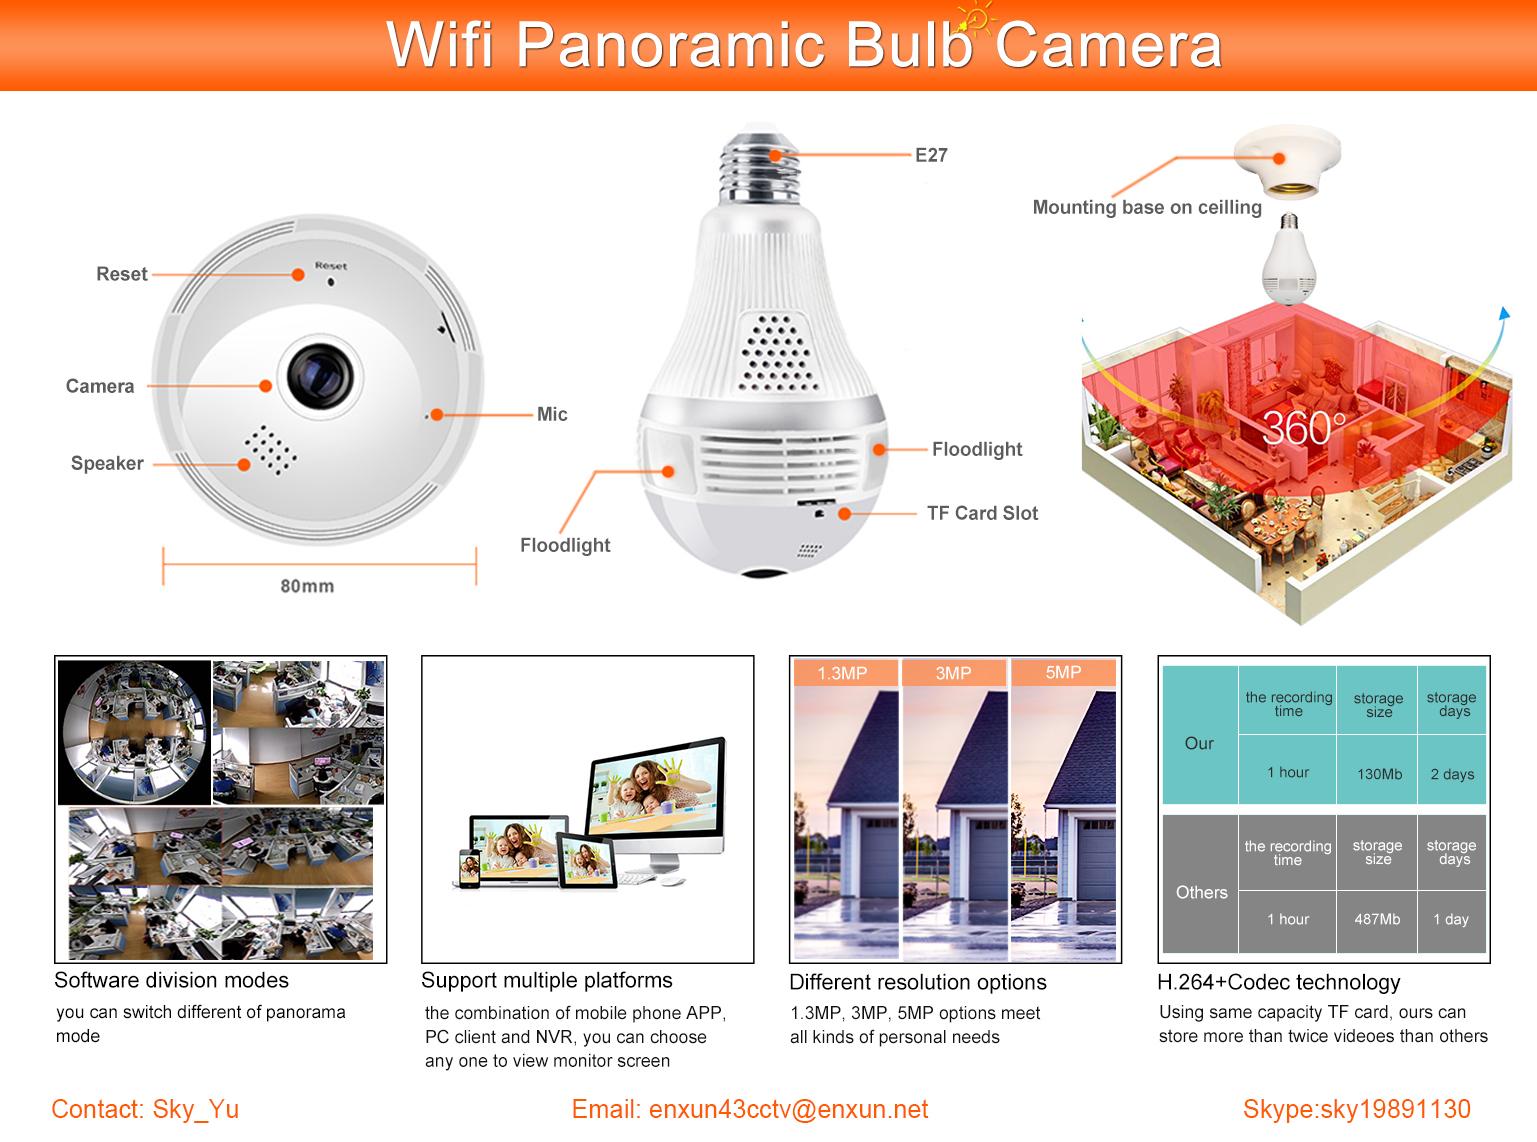 Ipc360 Light Bulb Camera Ptz Cctv Ip Camera With Night Vision 1 3mp - Buy  360 Light Bulb Camera,Ceiling Light Camera,Ip Camera With Night Vision